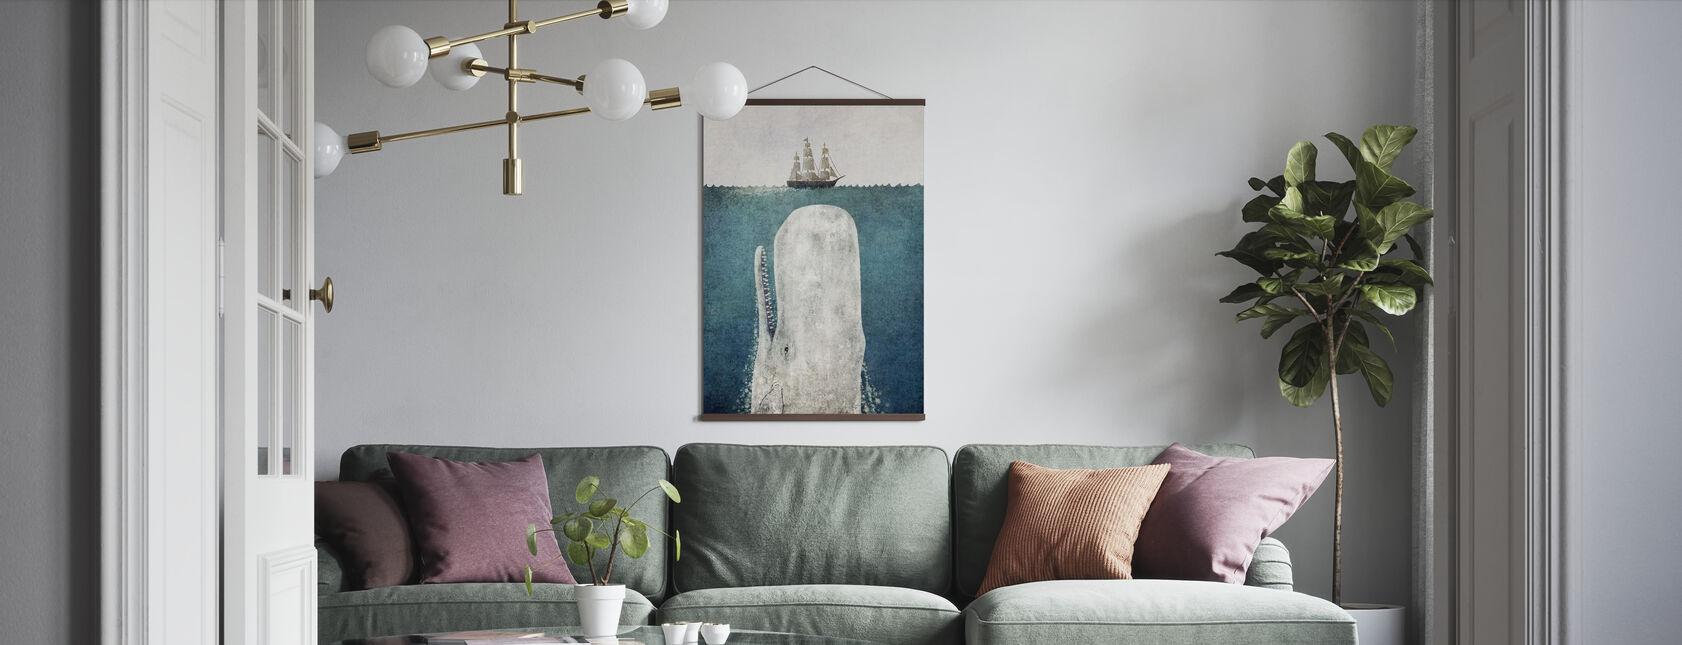 Balena Vintage - Poster - Salotto